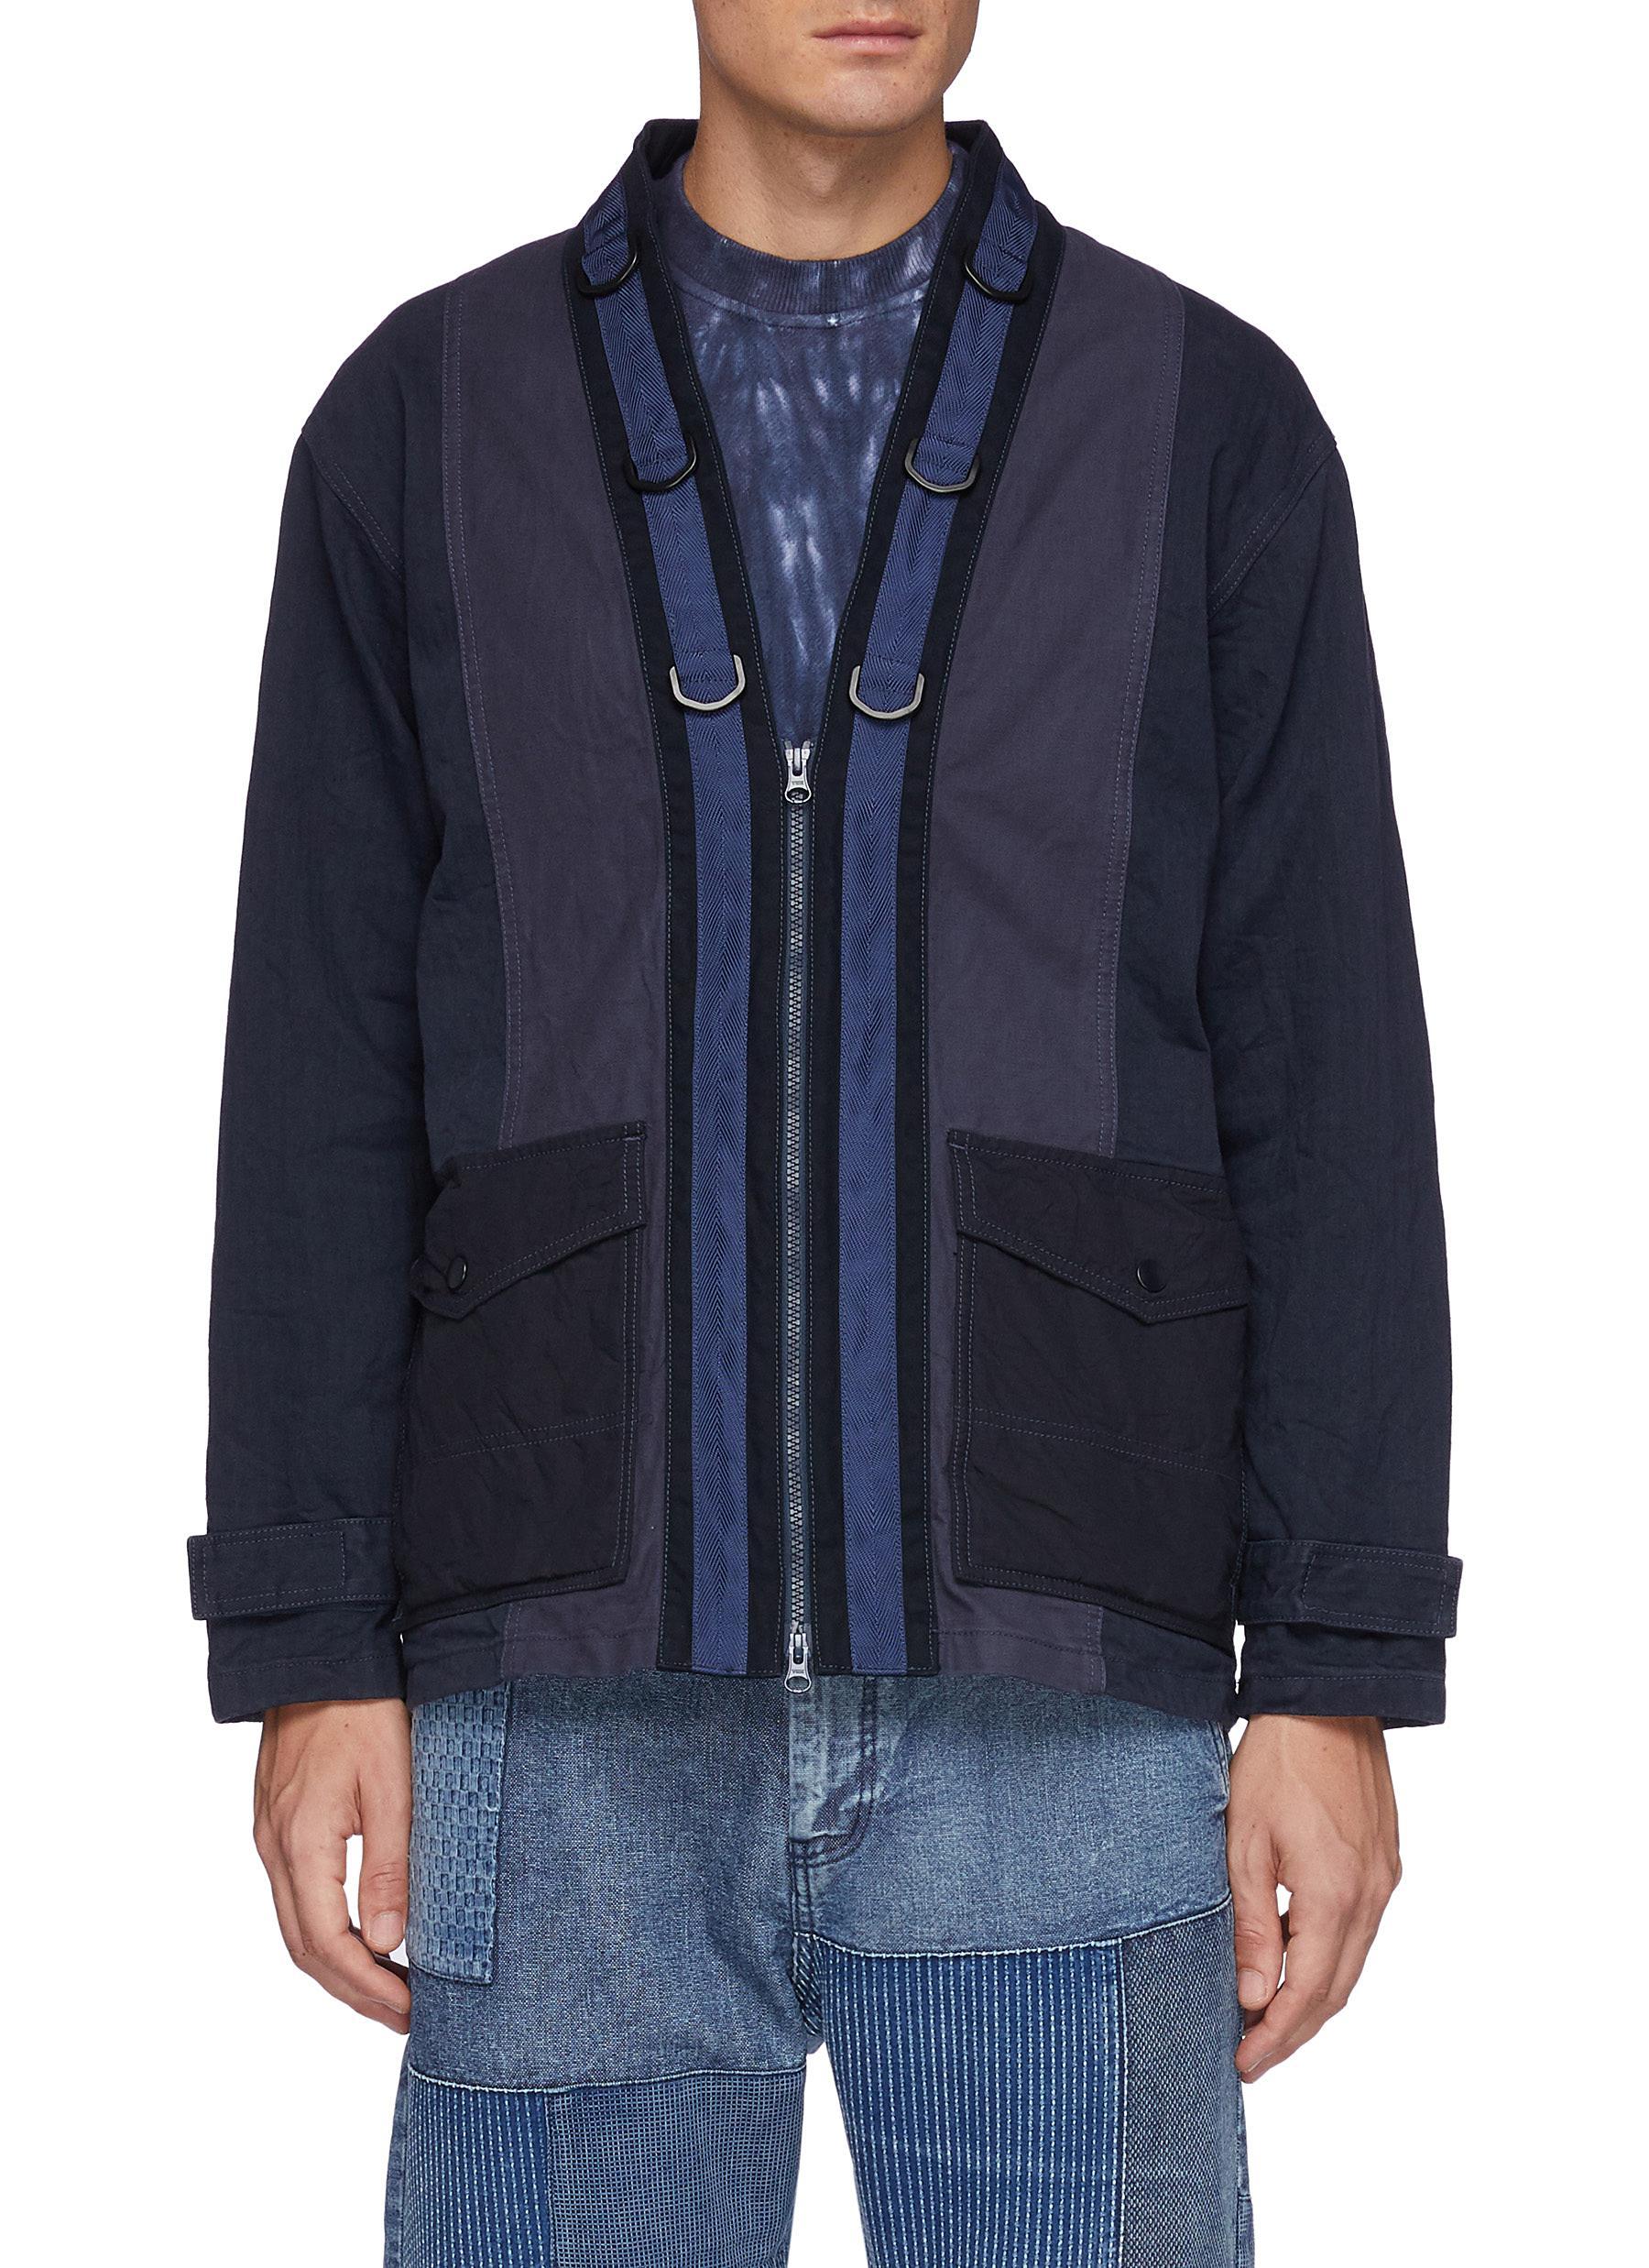 Flap Pocket Zip Up Cotton Miliary Haori Jacket